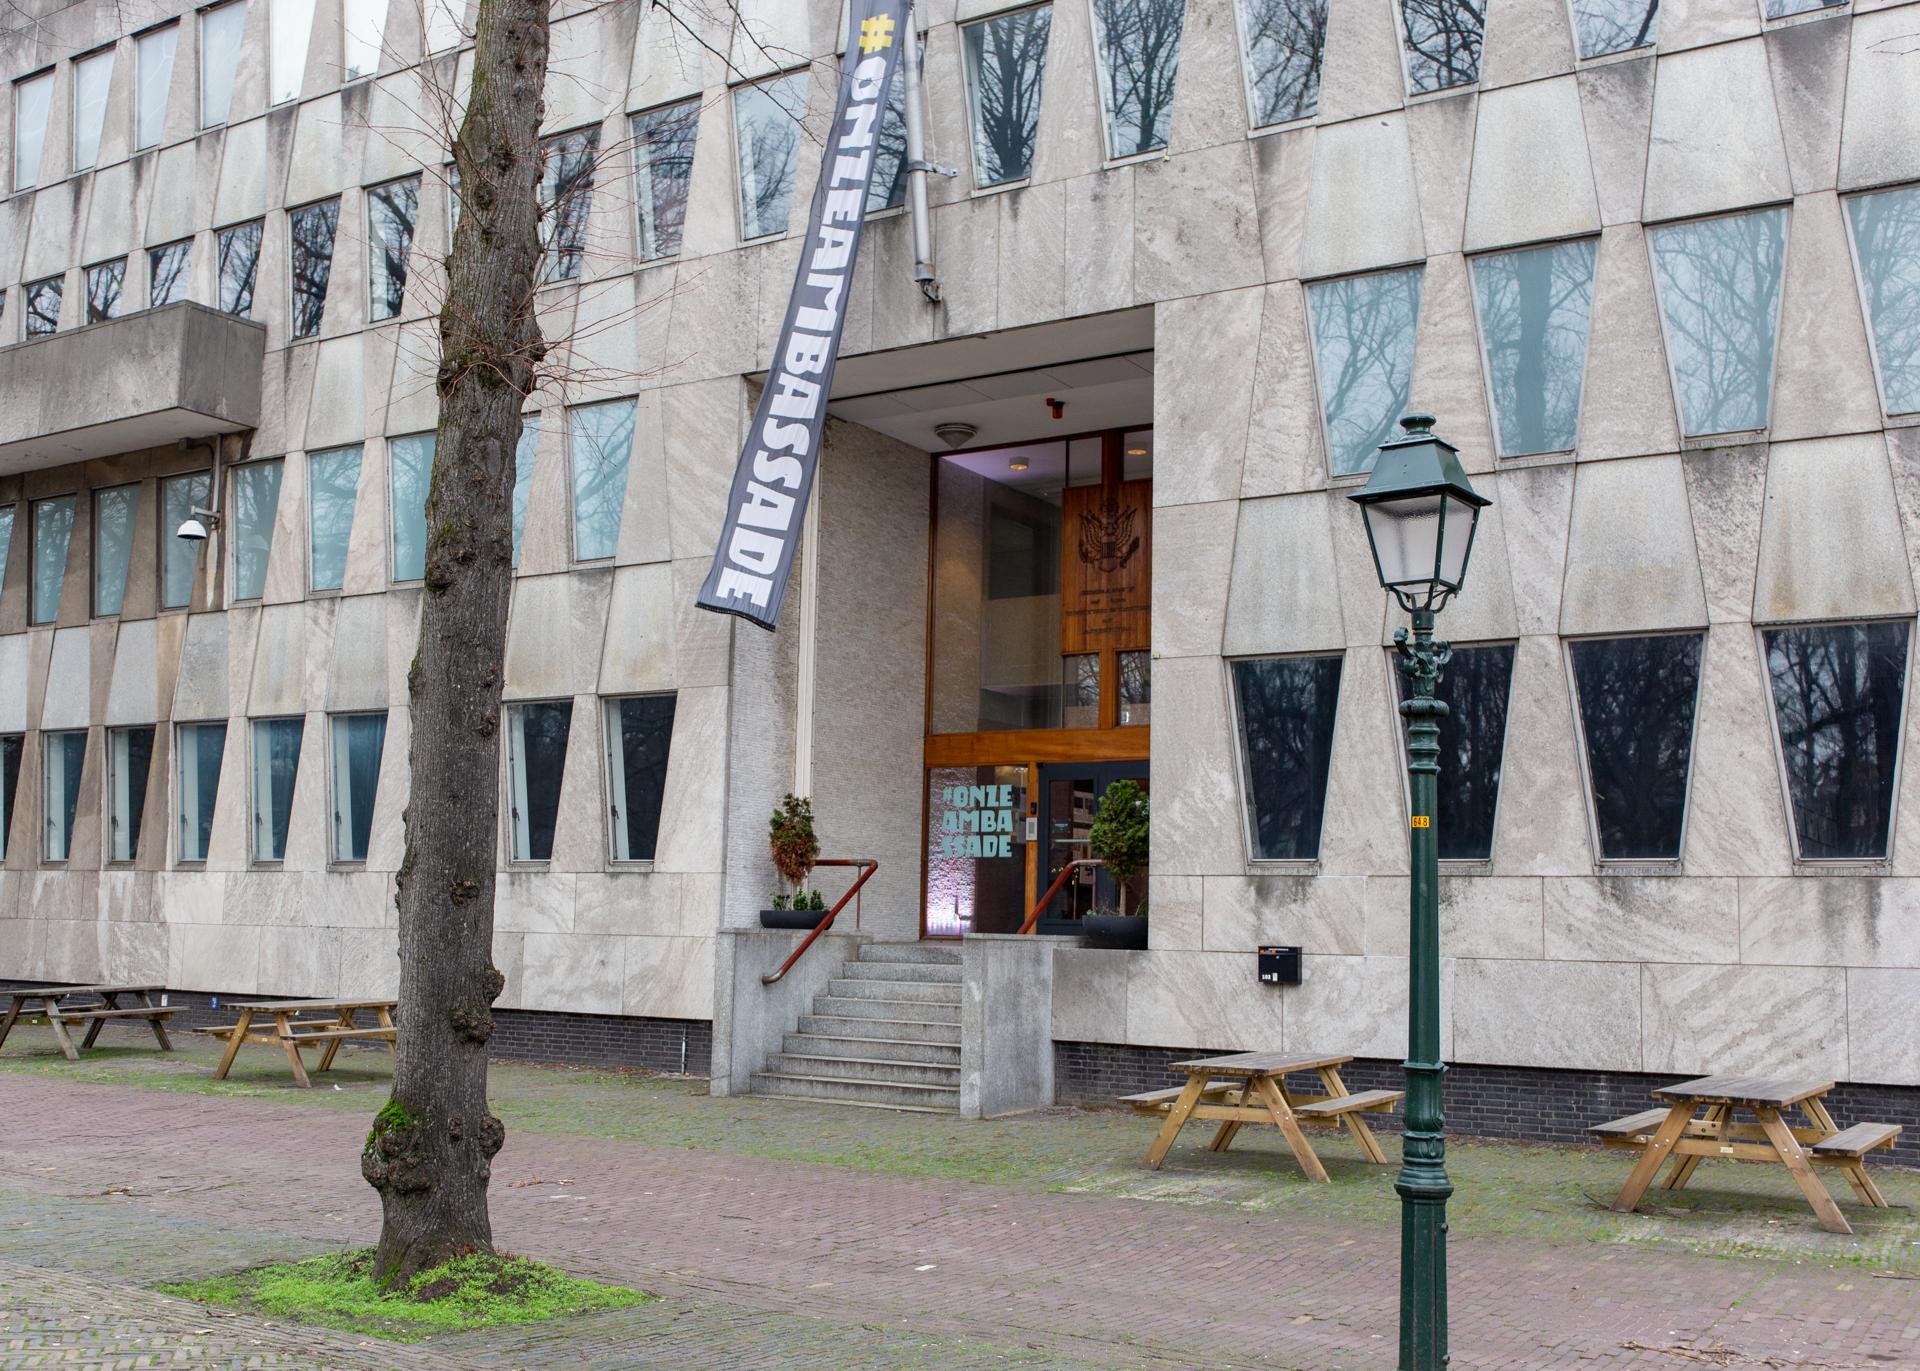 West Den Haag